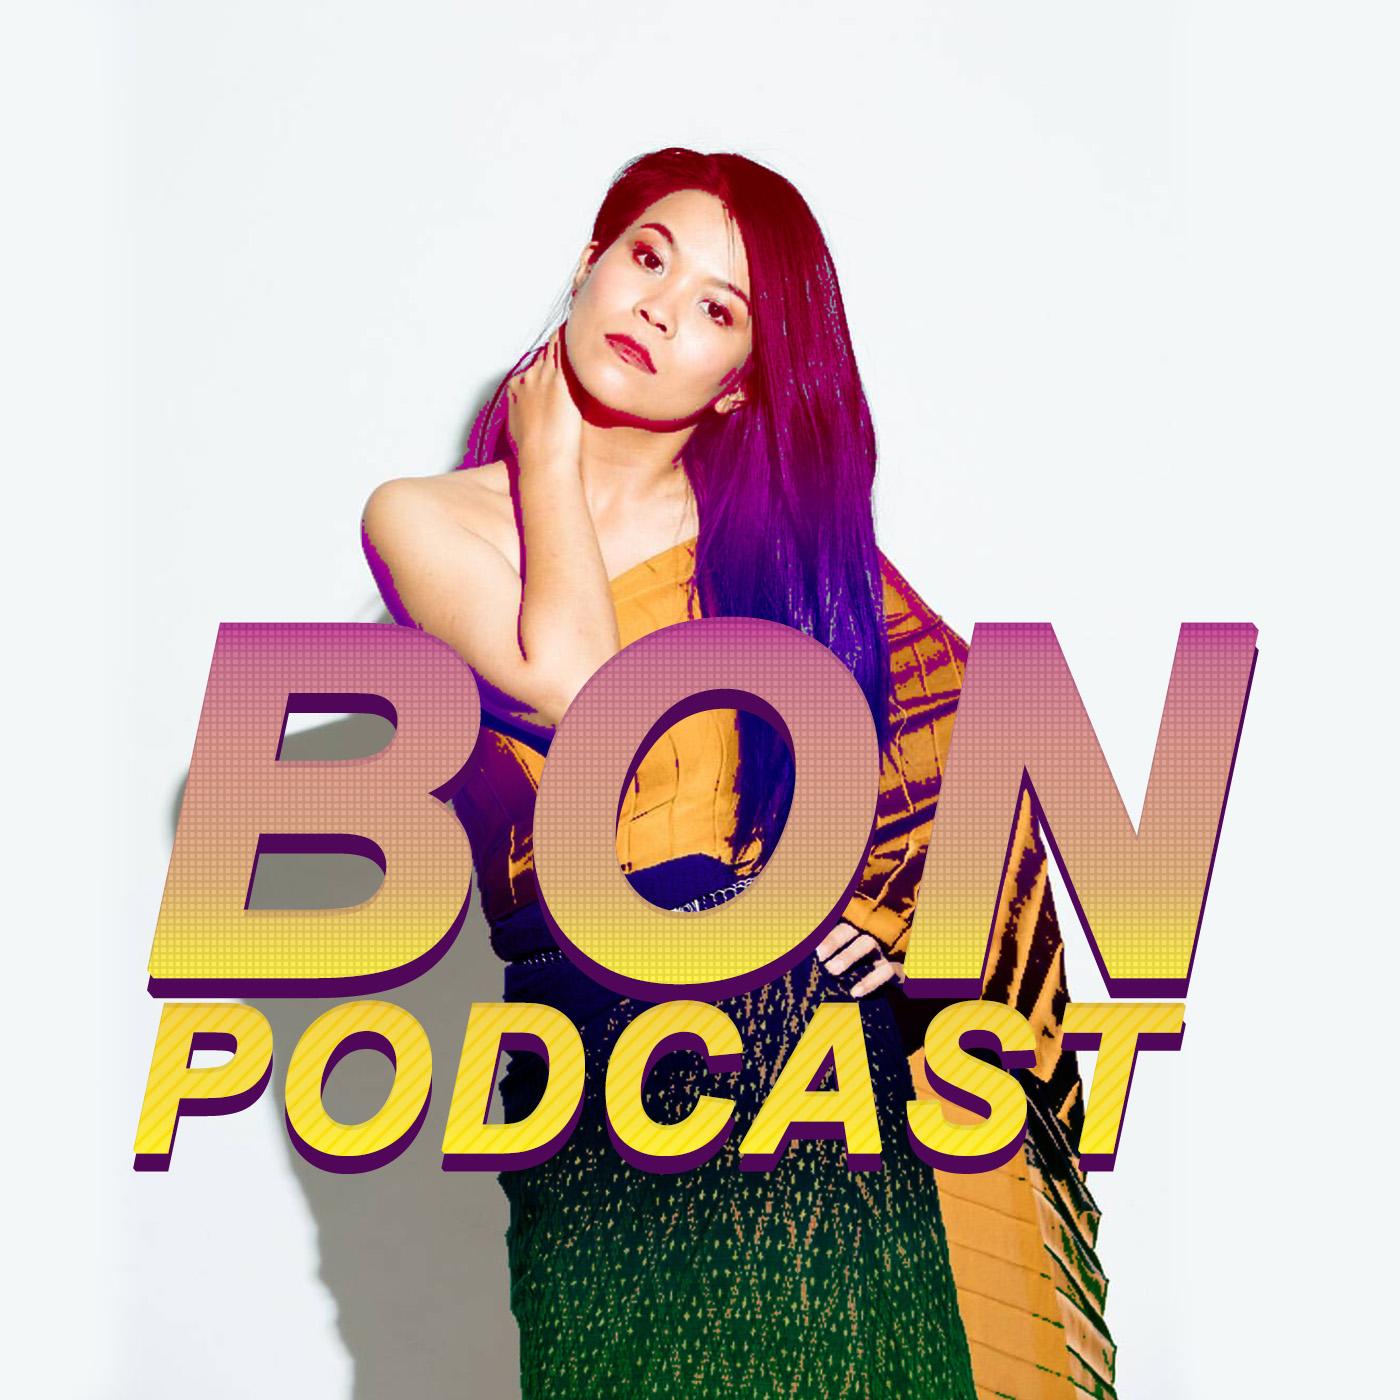 BonPodcast